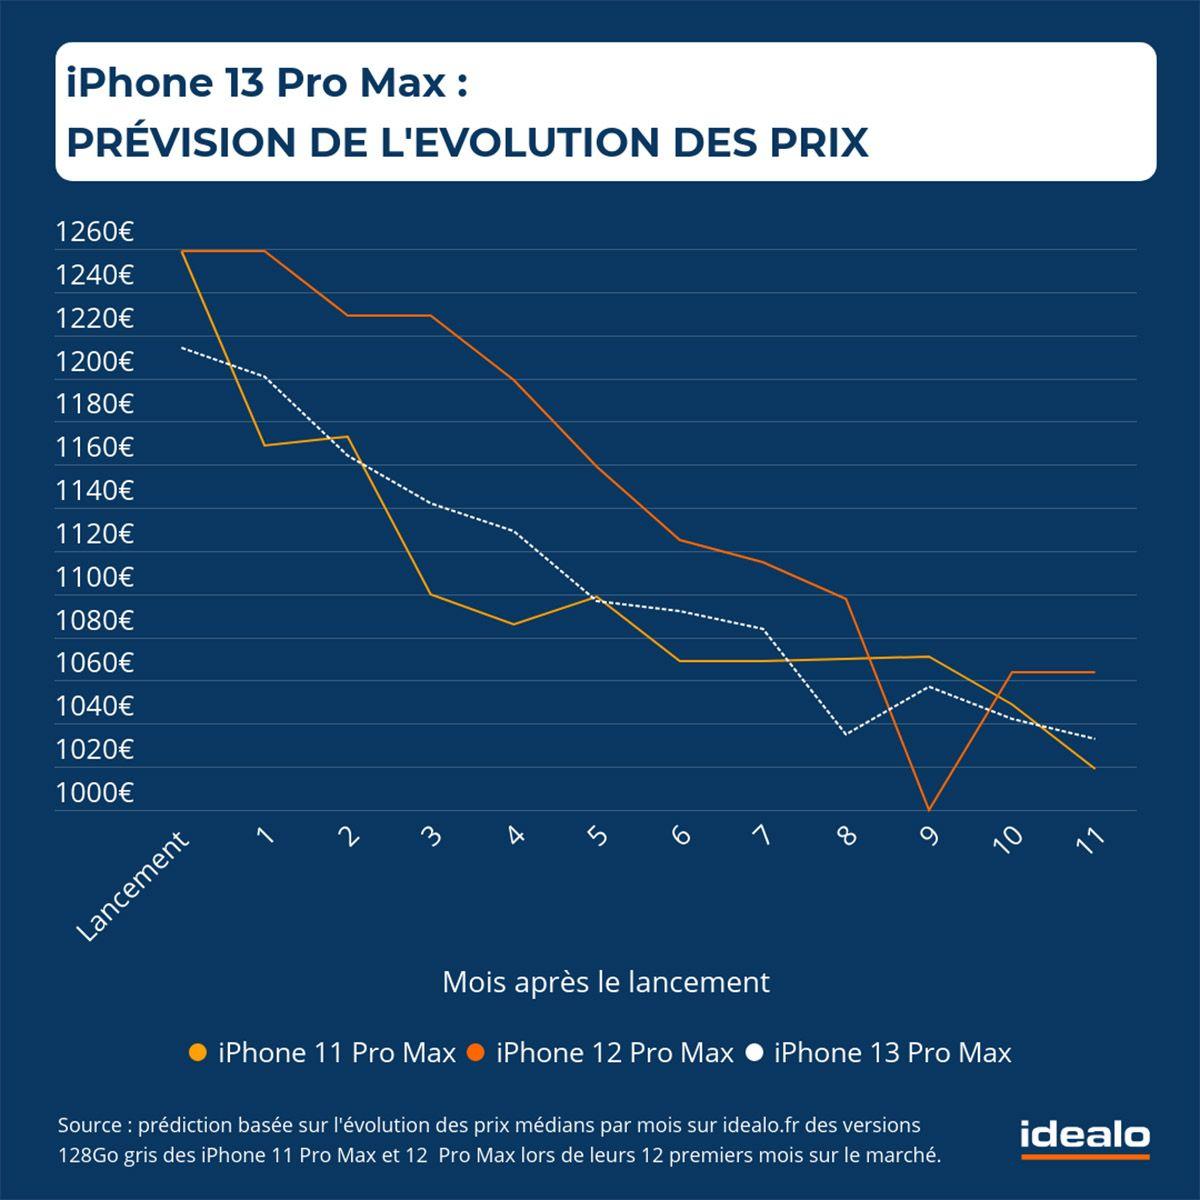 idealo iphone 13 pro max